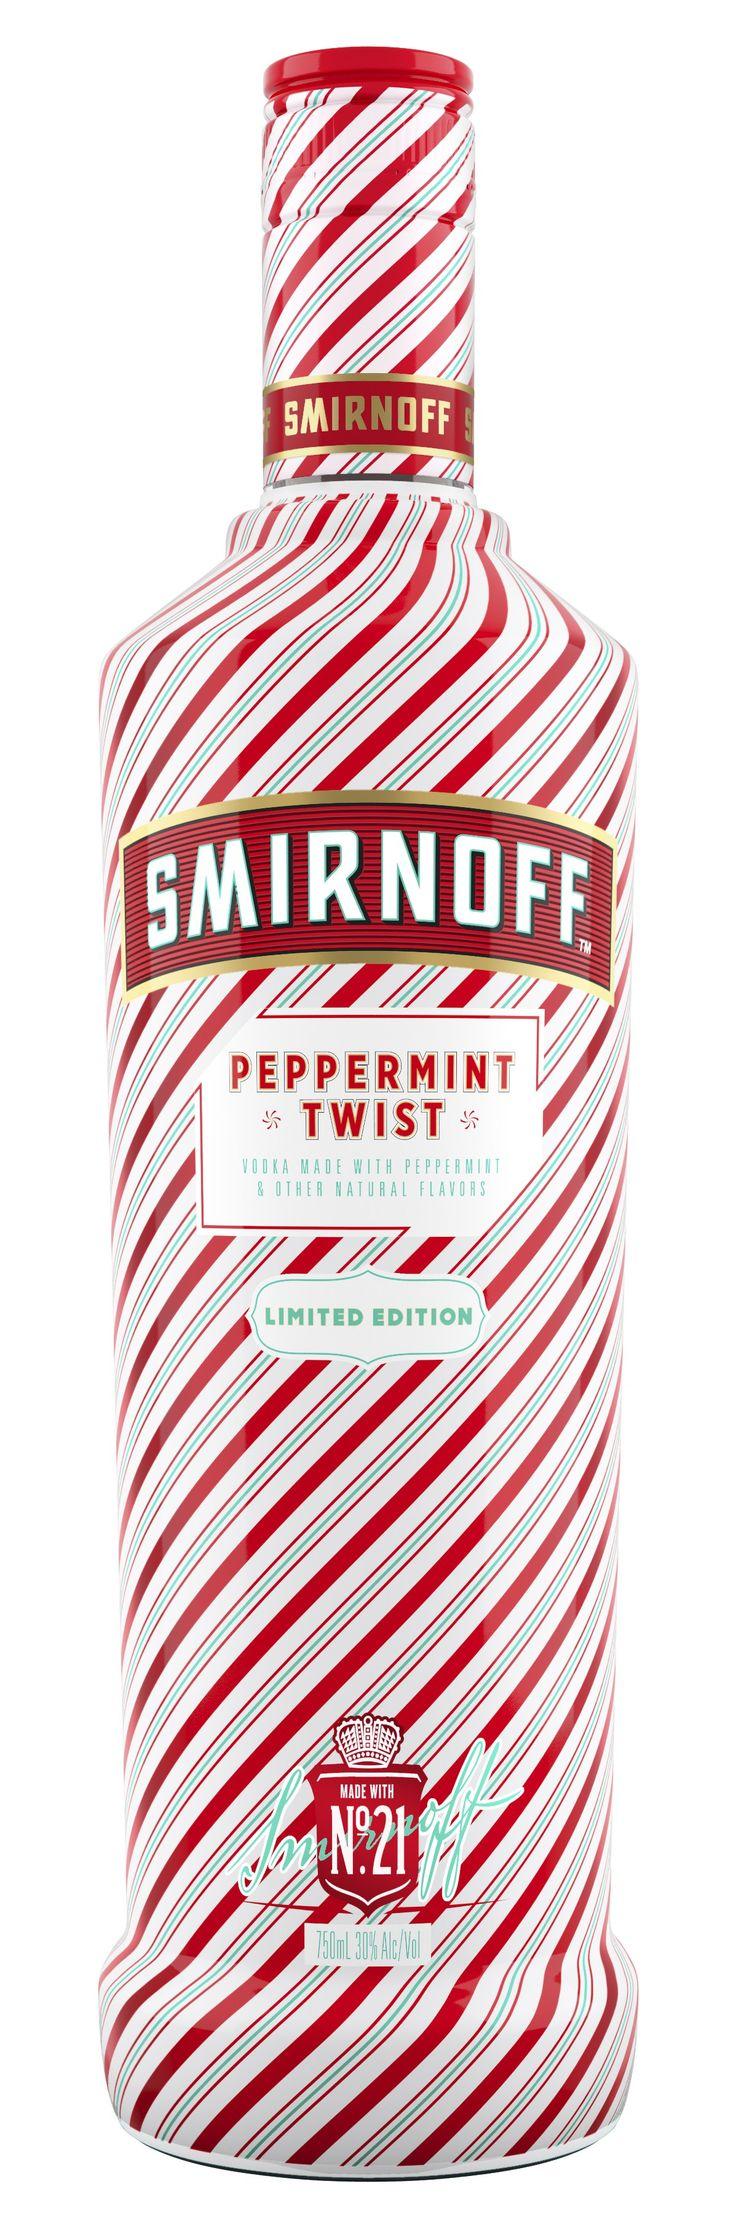 SMIRNOFF Peppermint Twist Cocktail Recipes